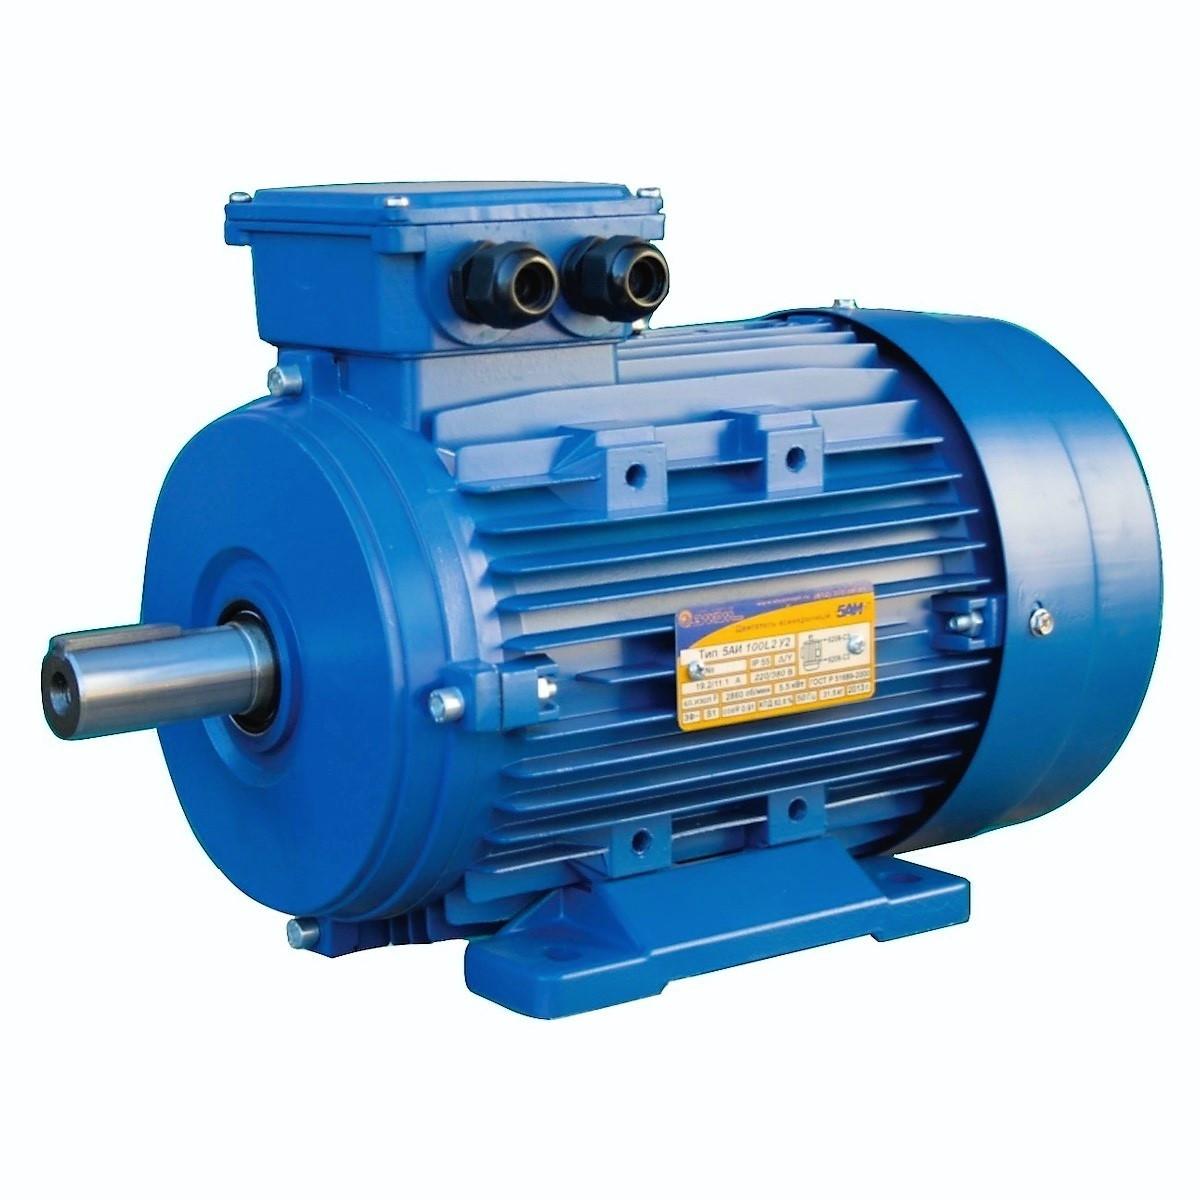 Электродвигатель 5АИ 80 b4 1.5кВт, 1500 об/мин